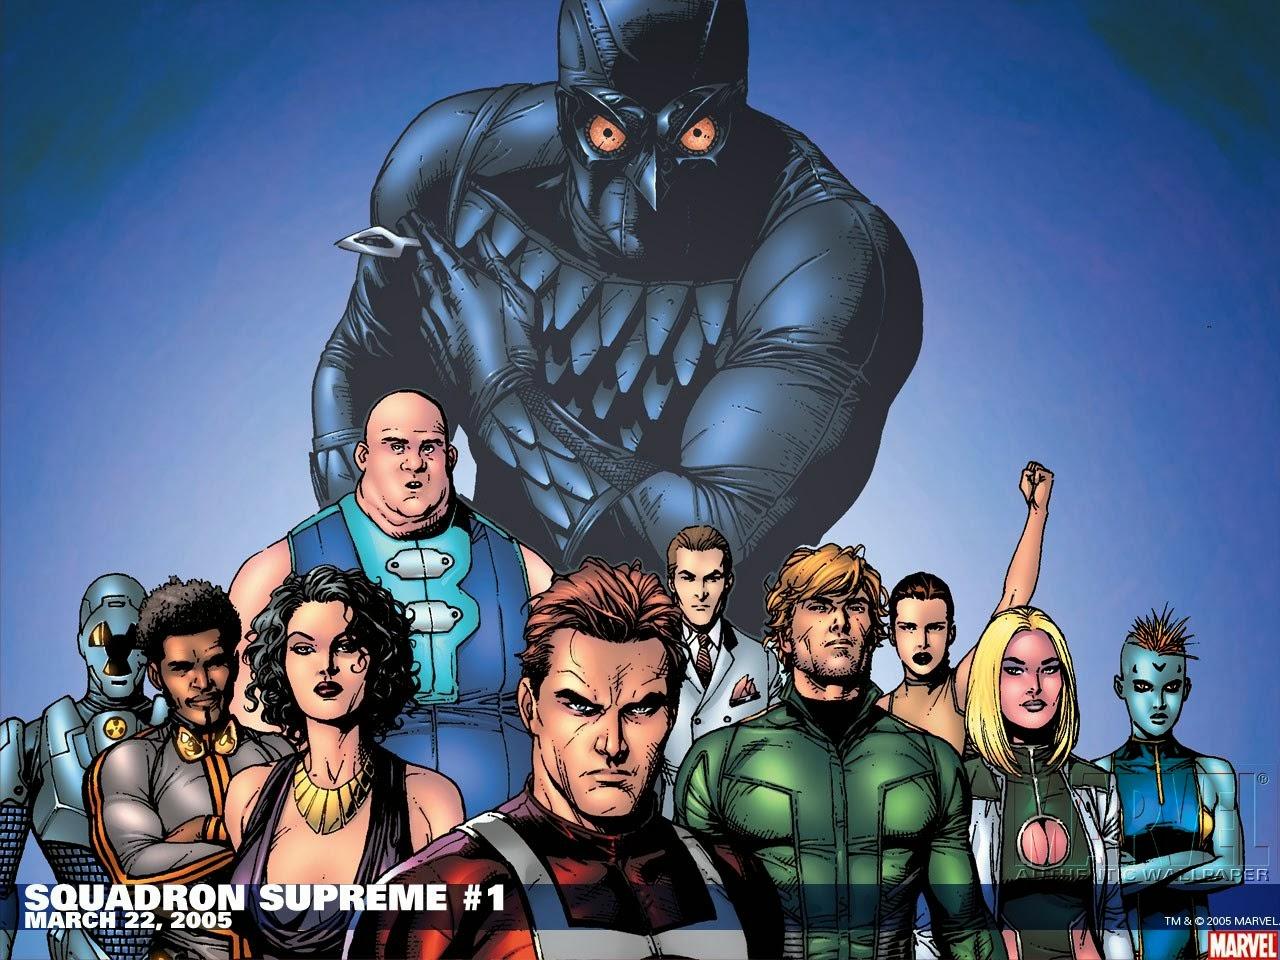 Fondos De Pantalla Supreme: Fondo De Pantalla Marvel Squadron Supreme